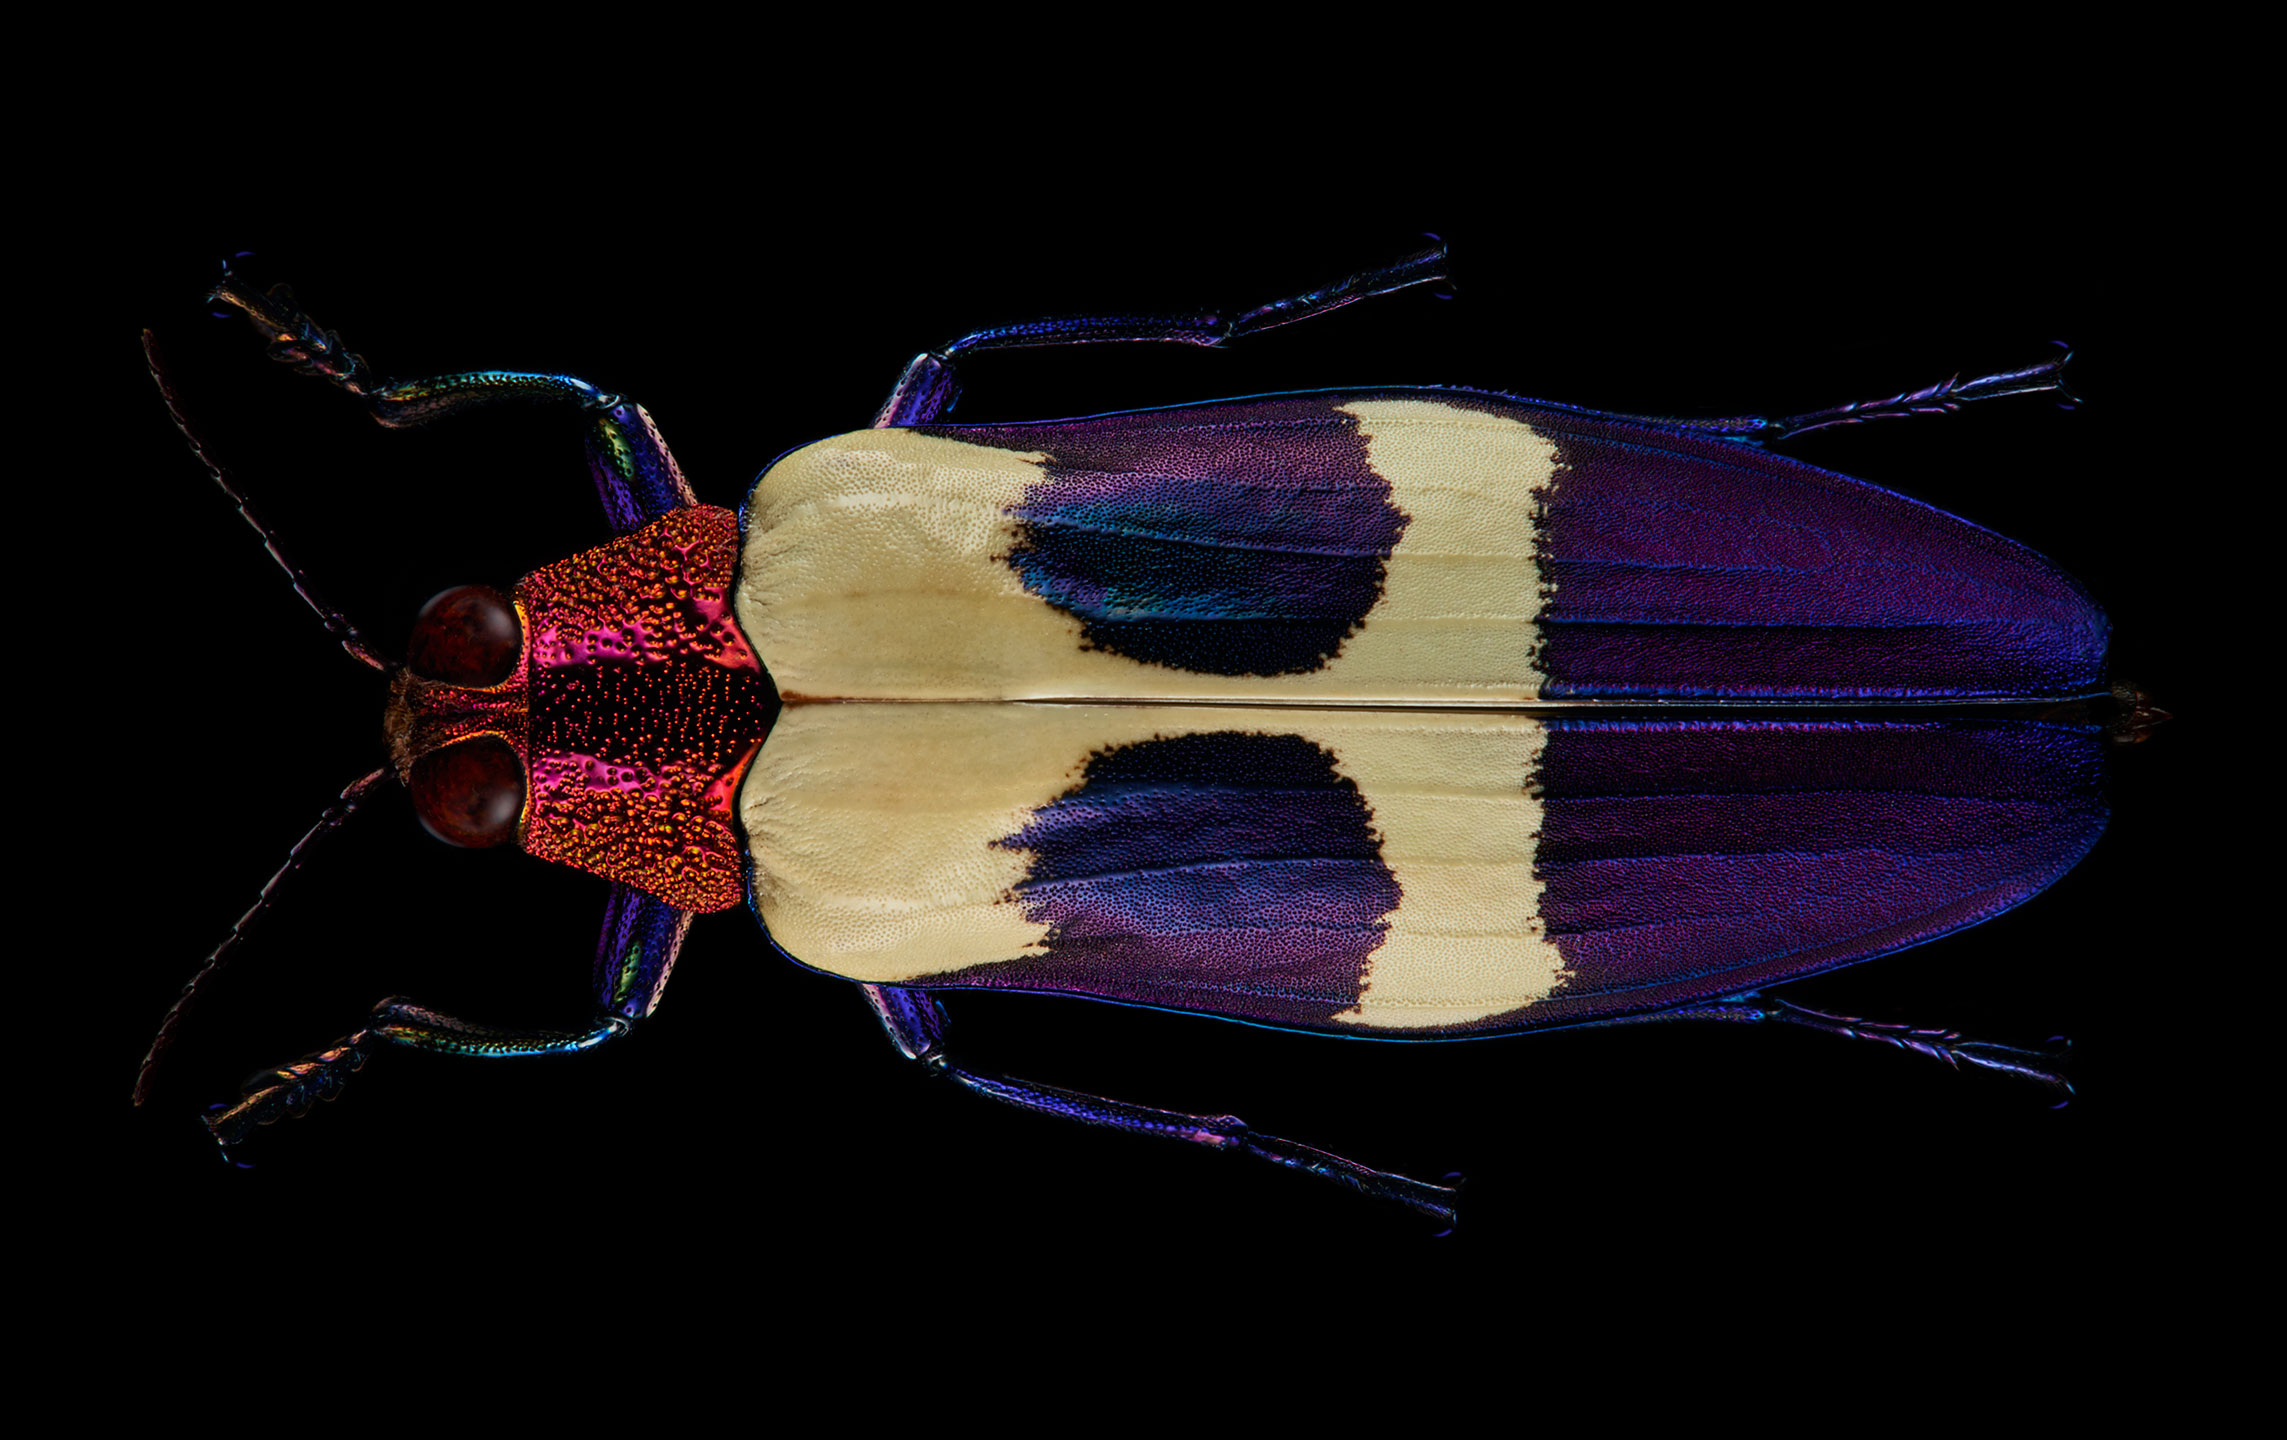 "<a href=""//mrsteel.london/shop/red-speckled-jewel-beetle/"">REVEAL DETAILS / BUY</a>"